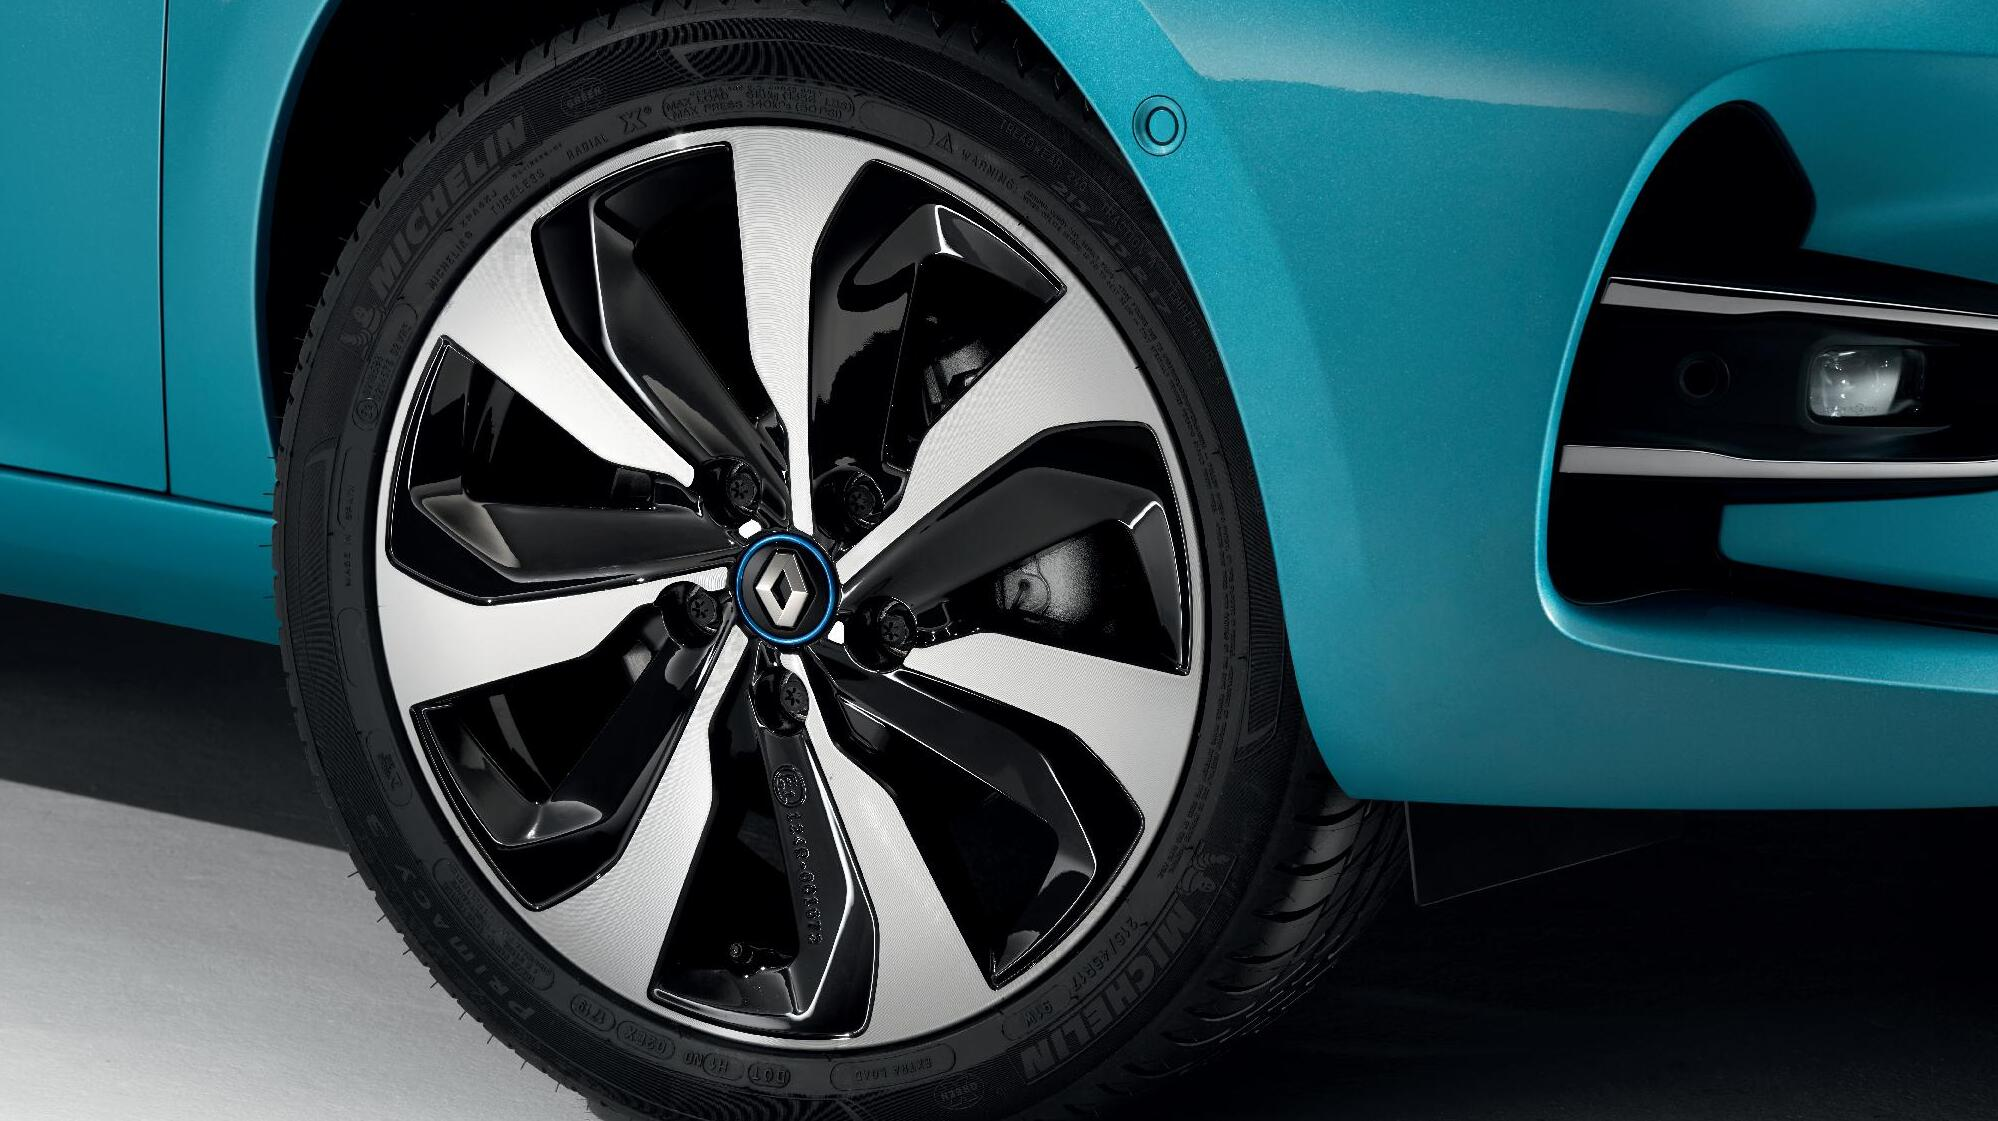 Systém upozornenia na pokles tlaku v pneumatikách